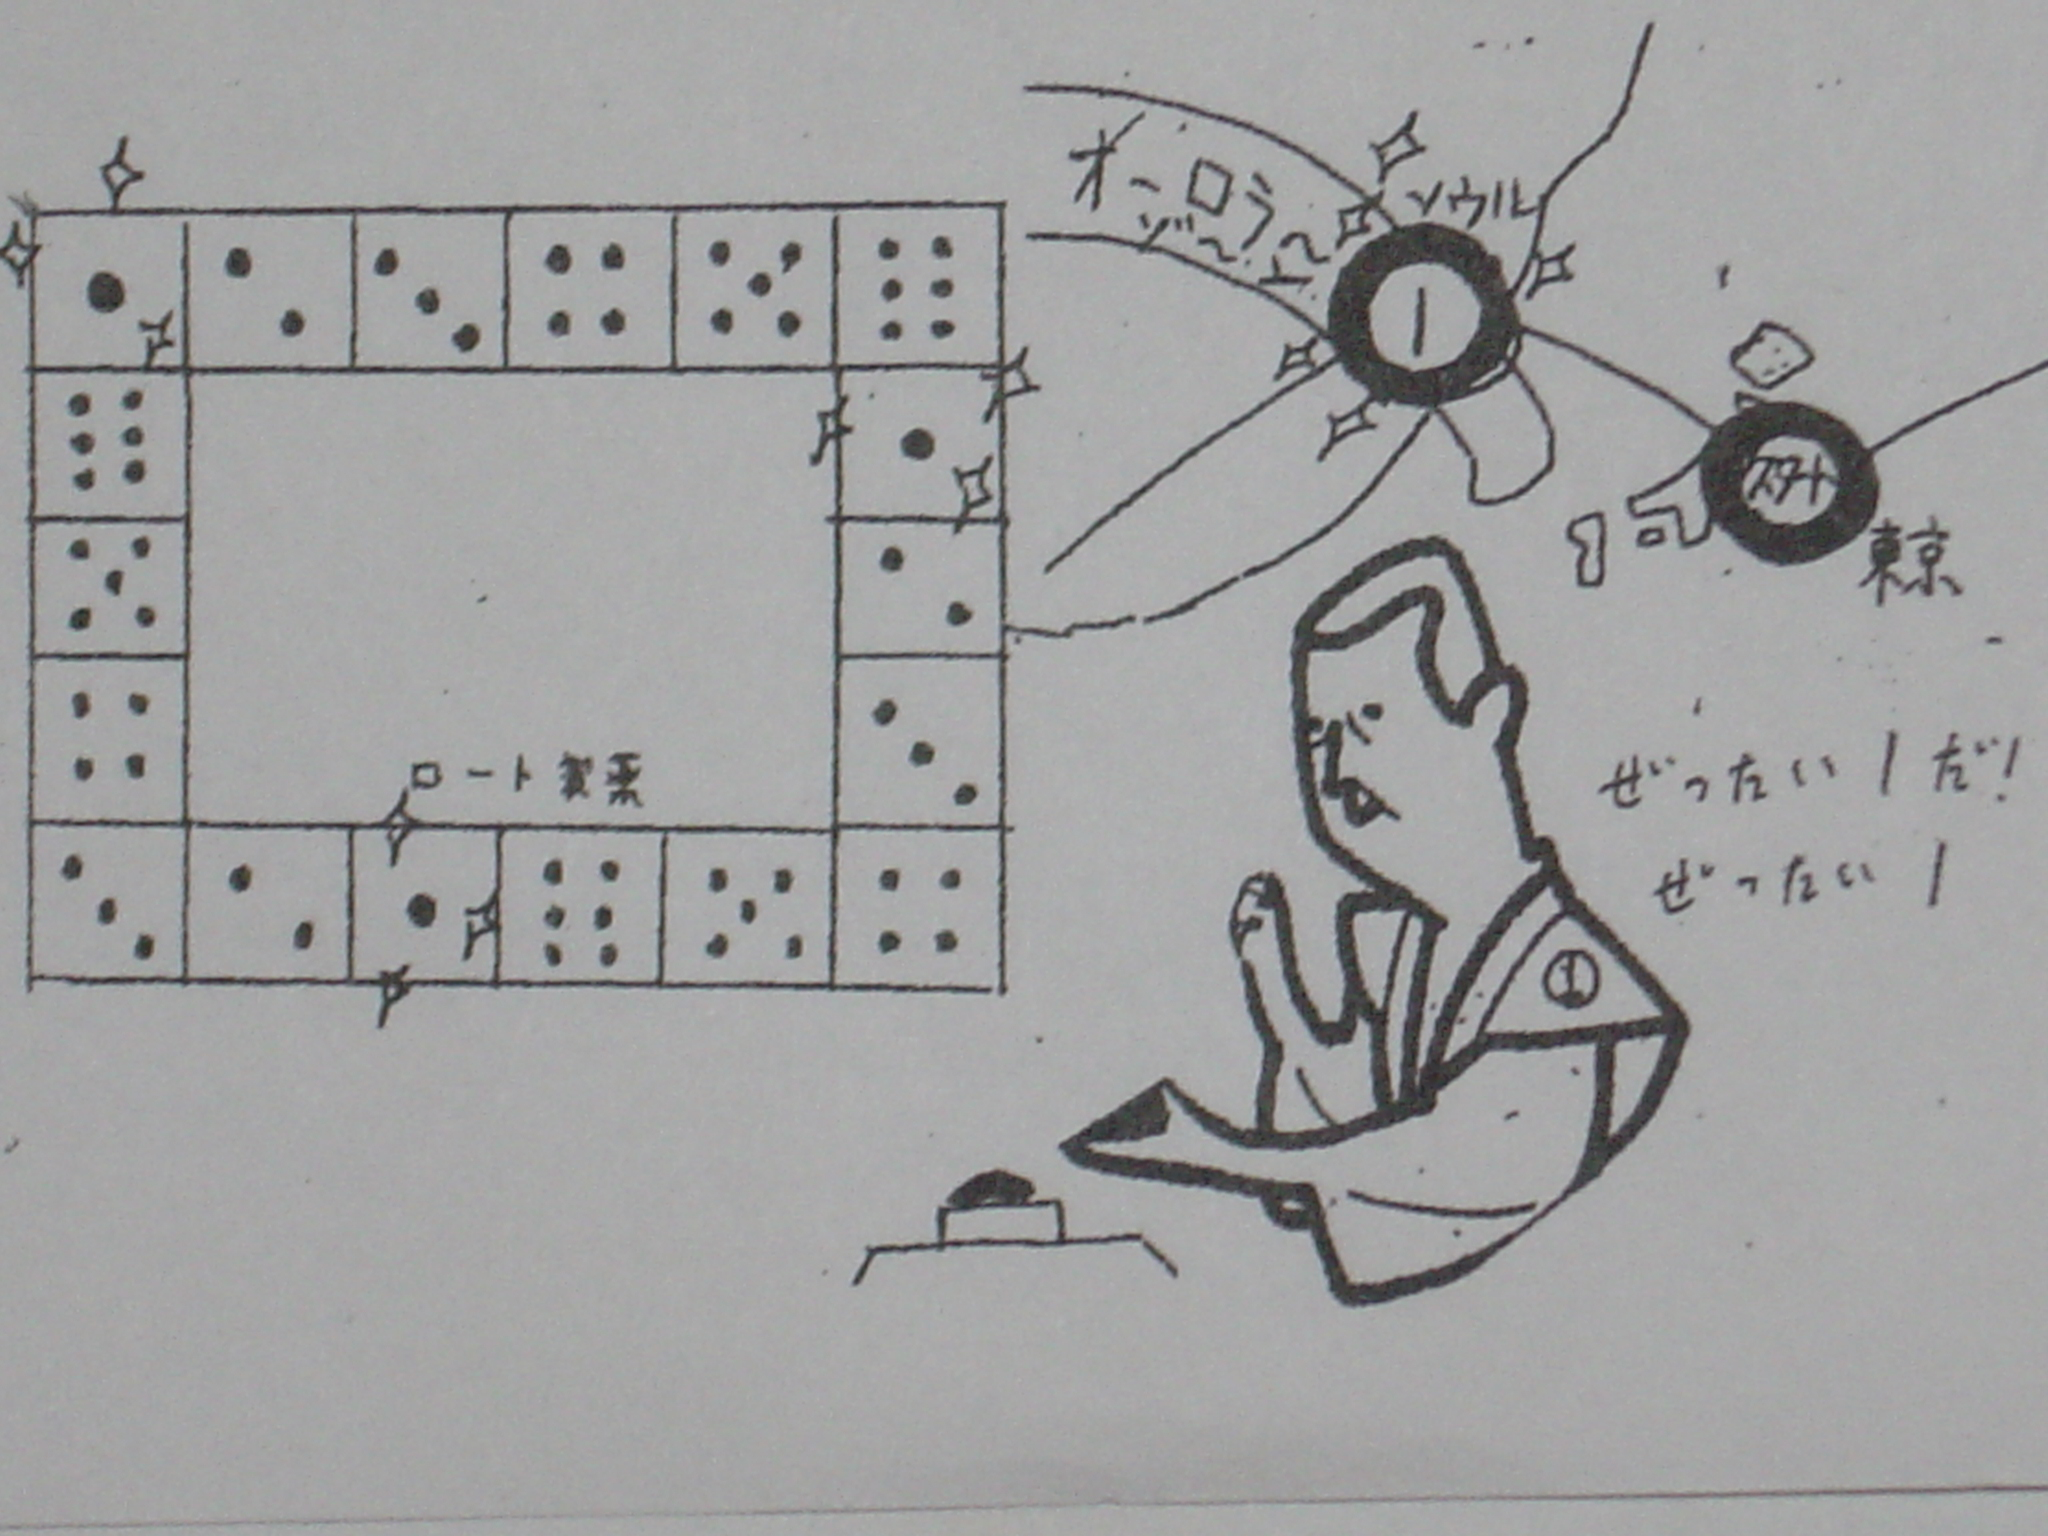 japaneseclass.jp 乾浩明 プロフィール